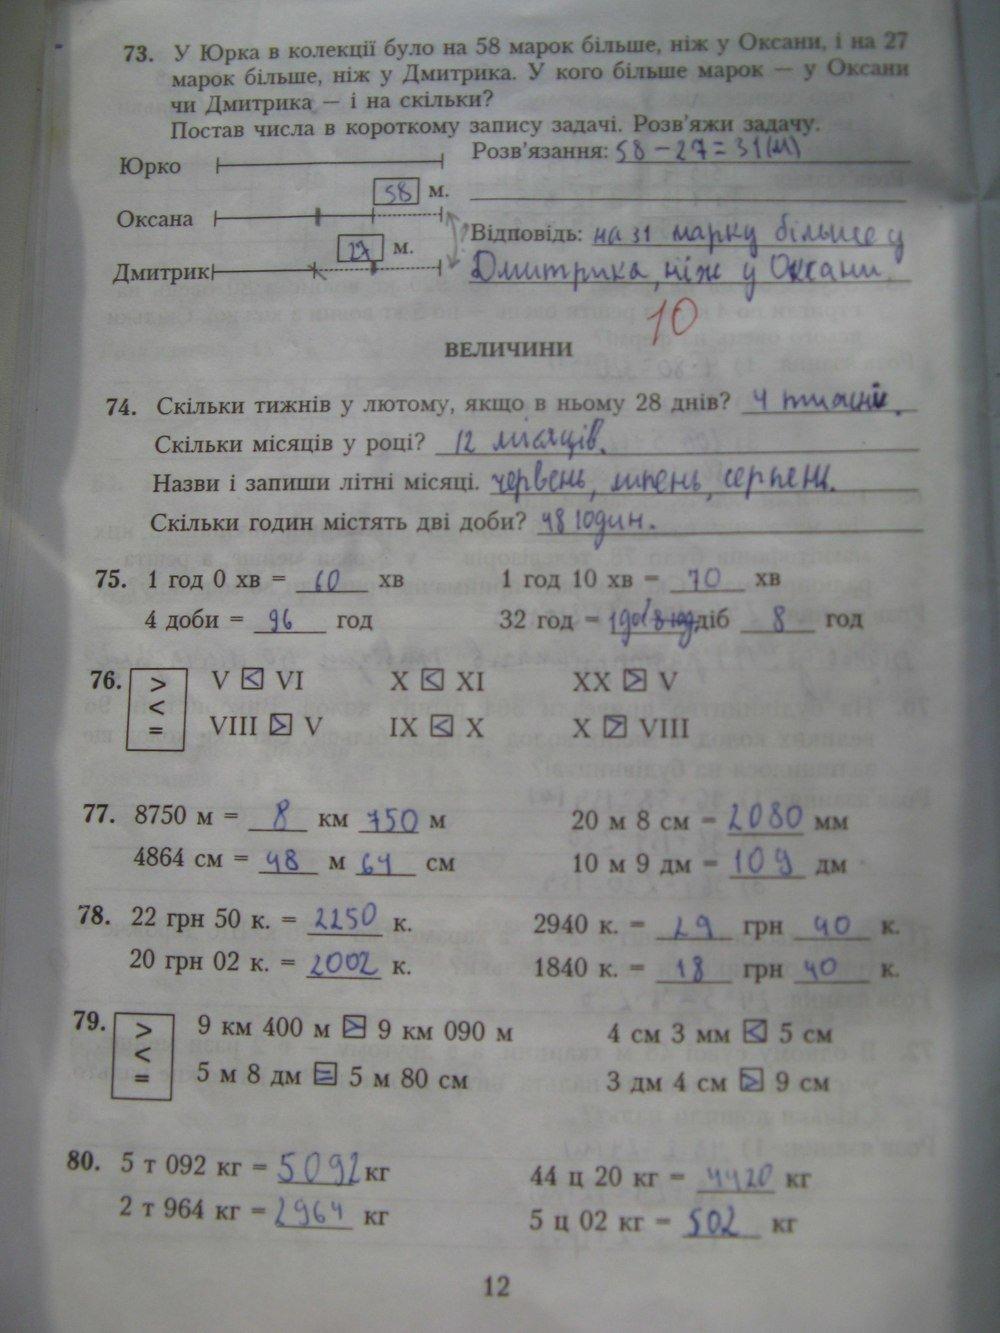 Богданович по гдз найти математики 2см 1м 2 класс видповидь